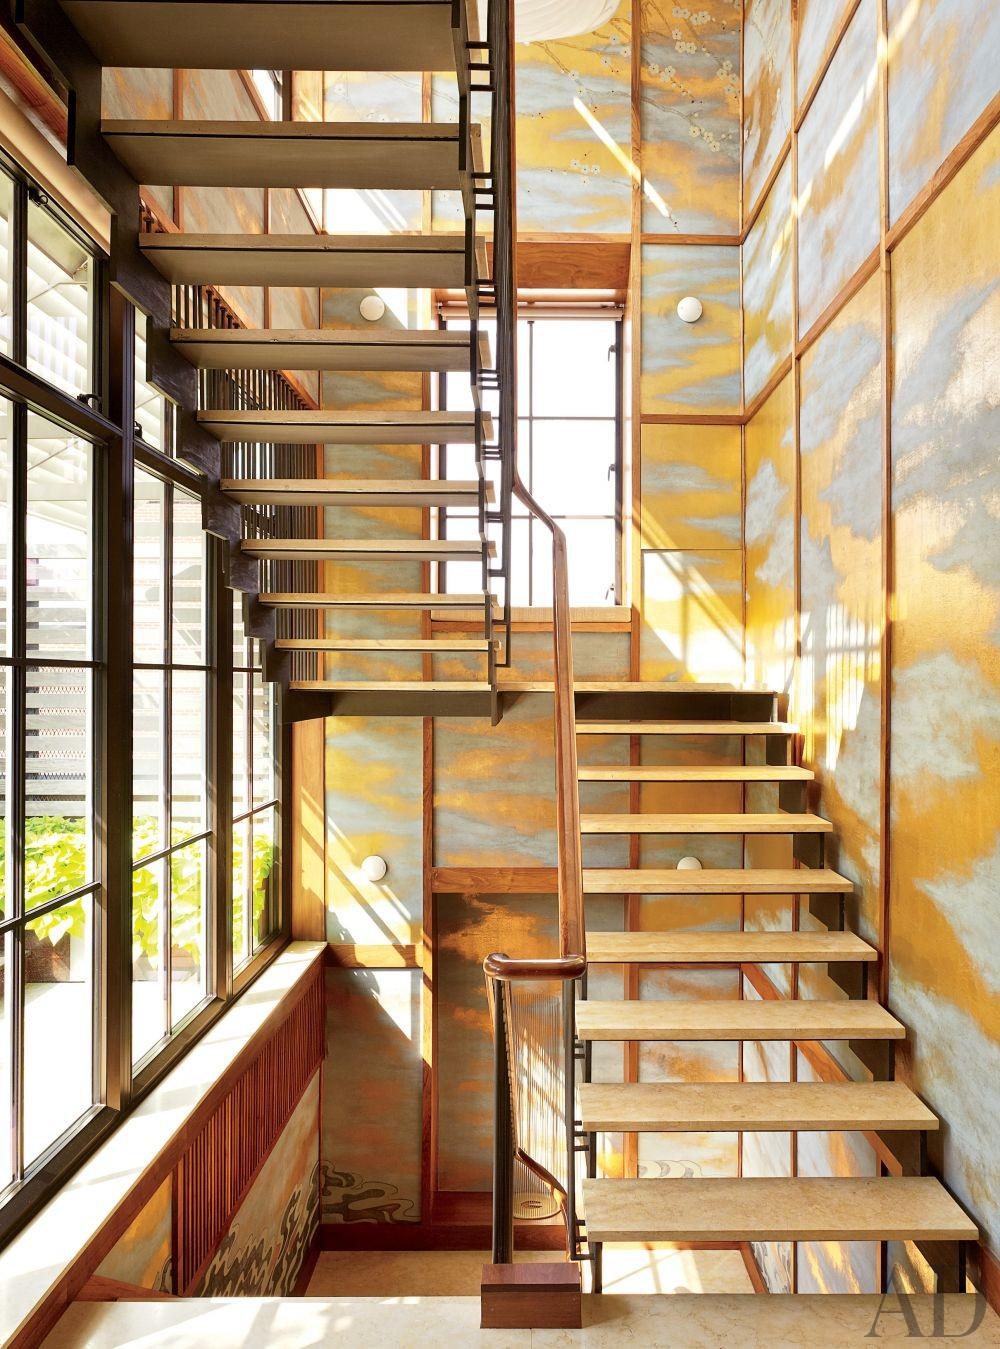 Modern Staircase/Hallway by De la Torre Design Studio and Cooper, Robertson & Partners in New York, New York